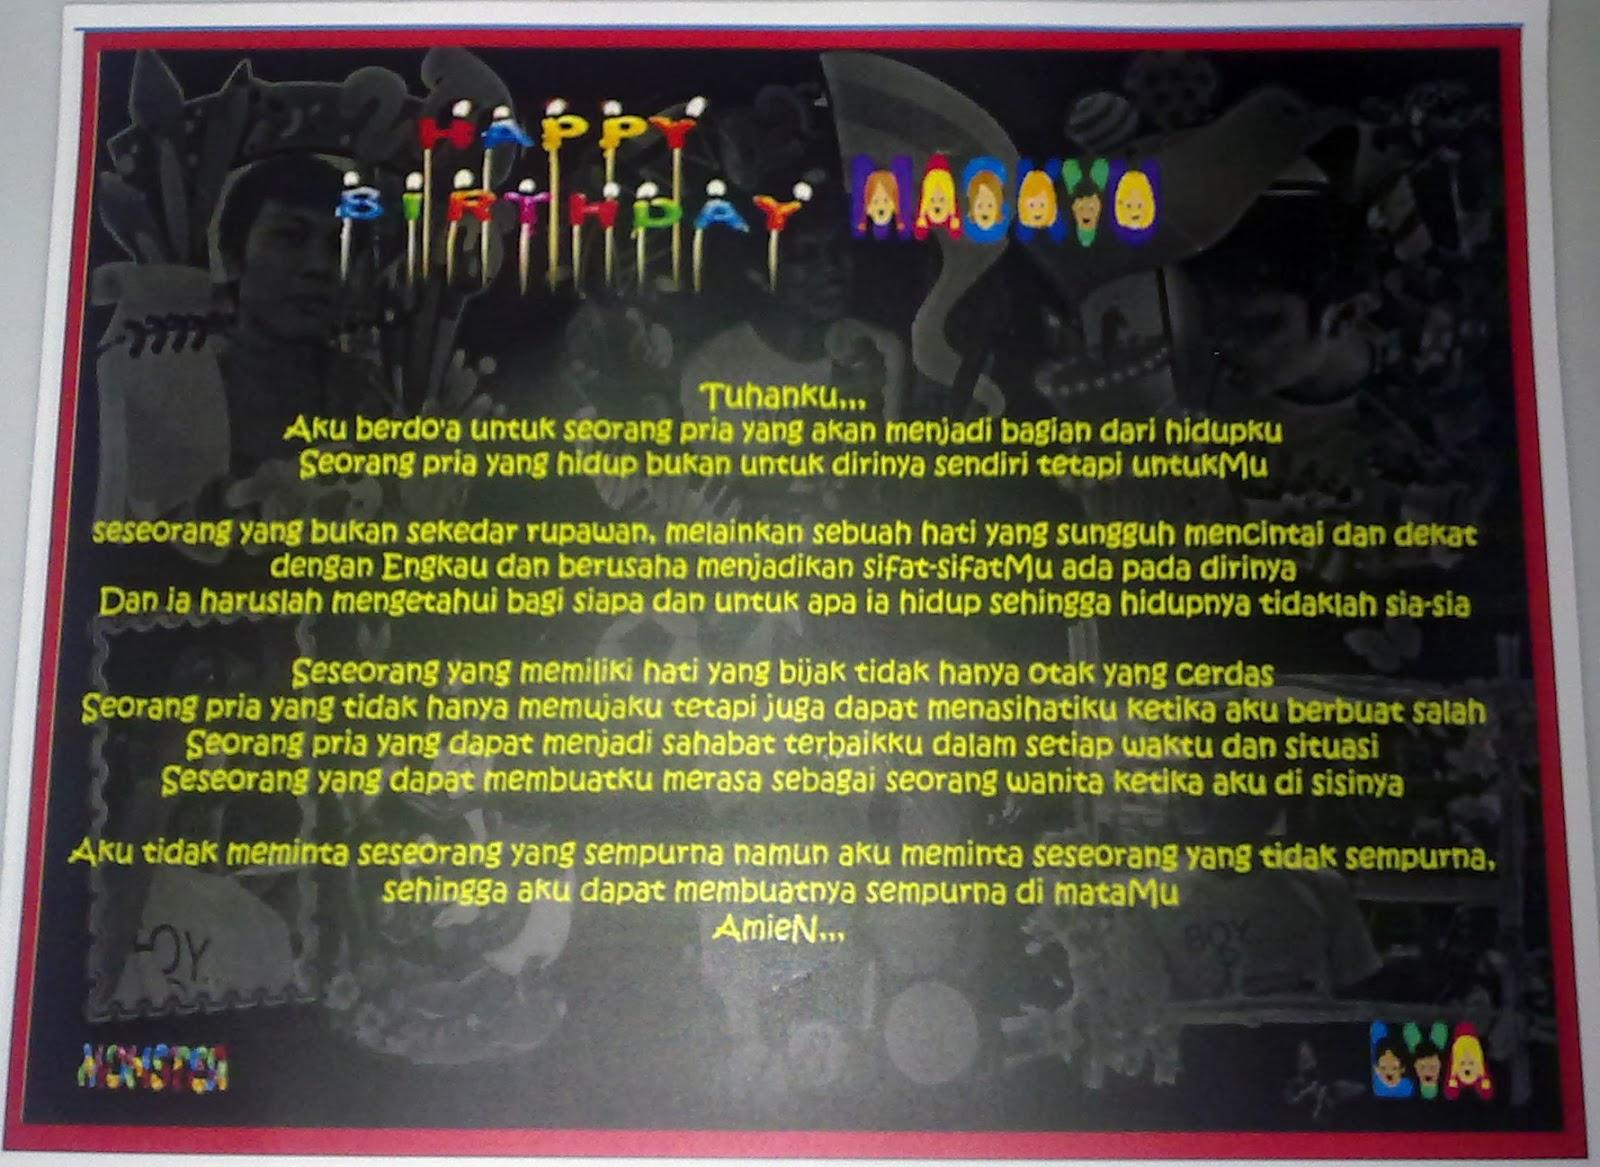 kartu+ucapan+ulang+tahun+untuk+sahabat+1